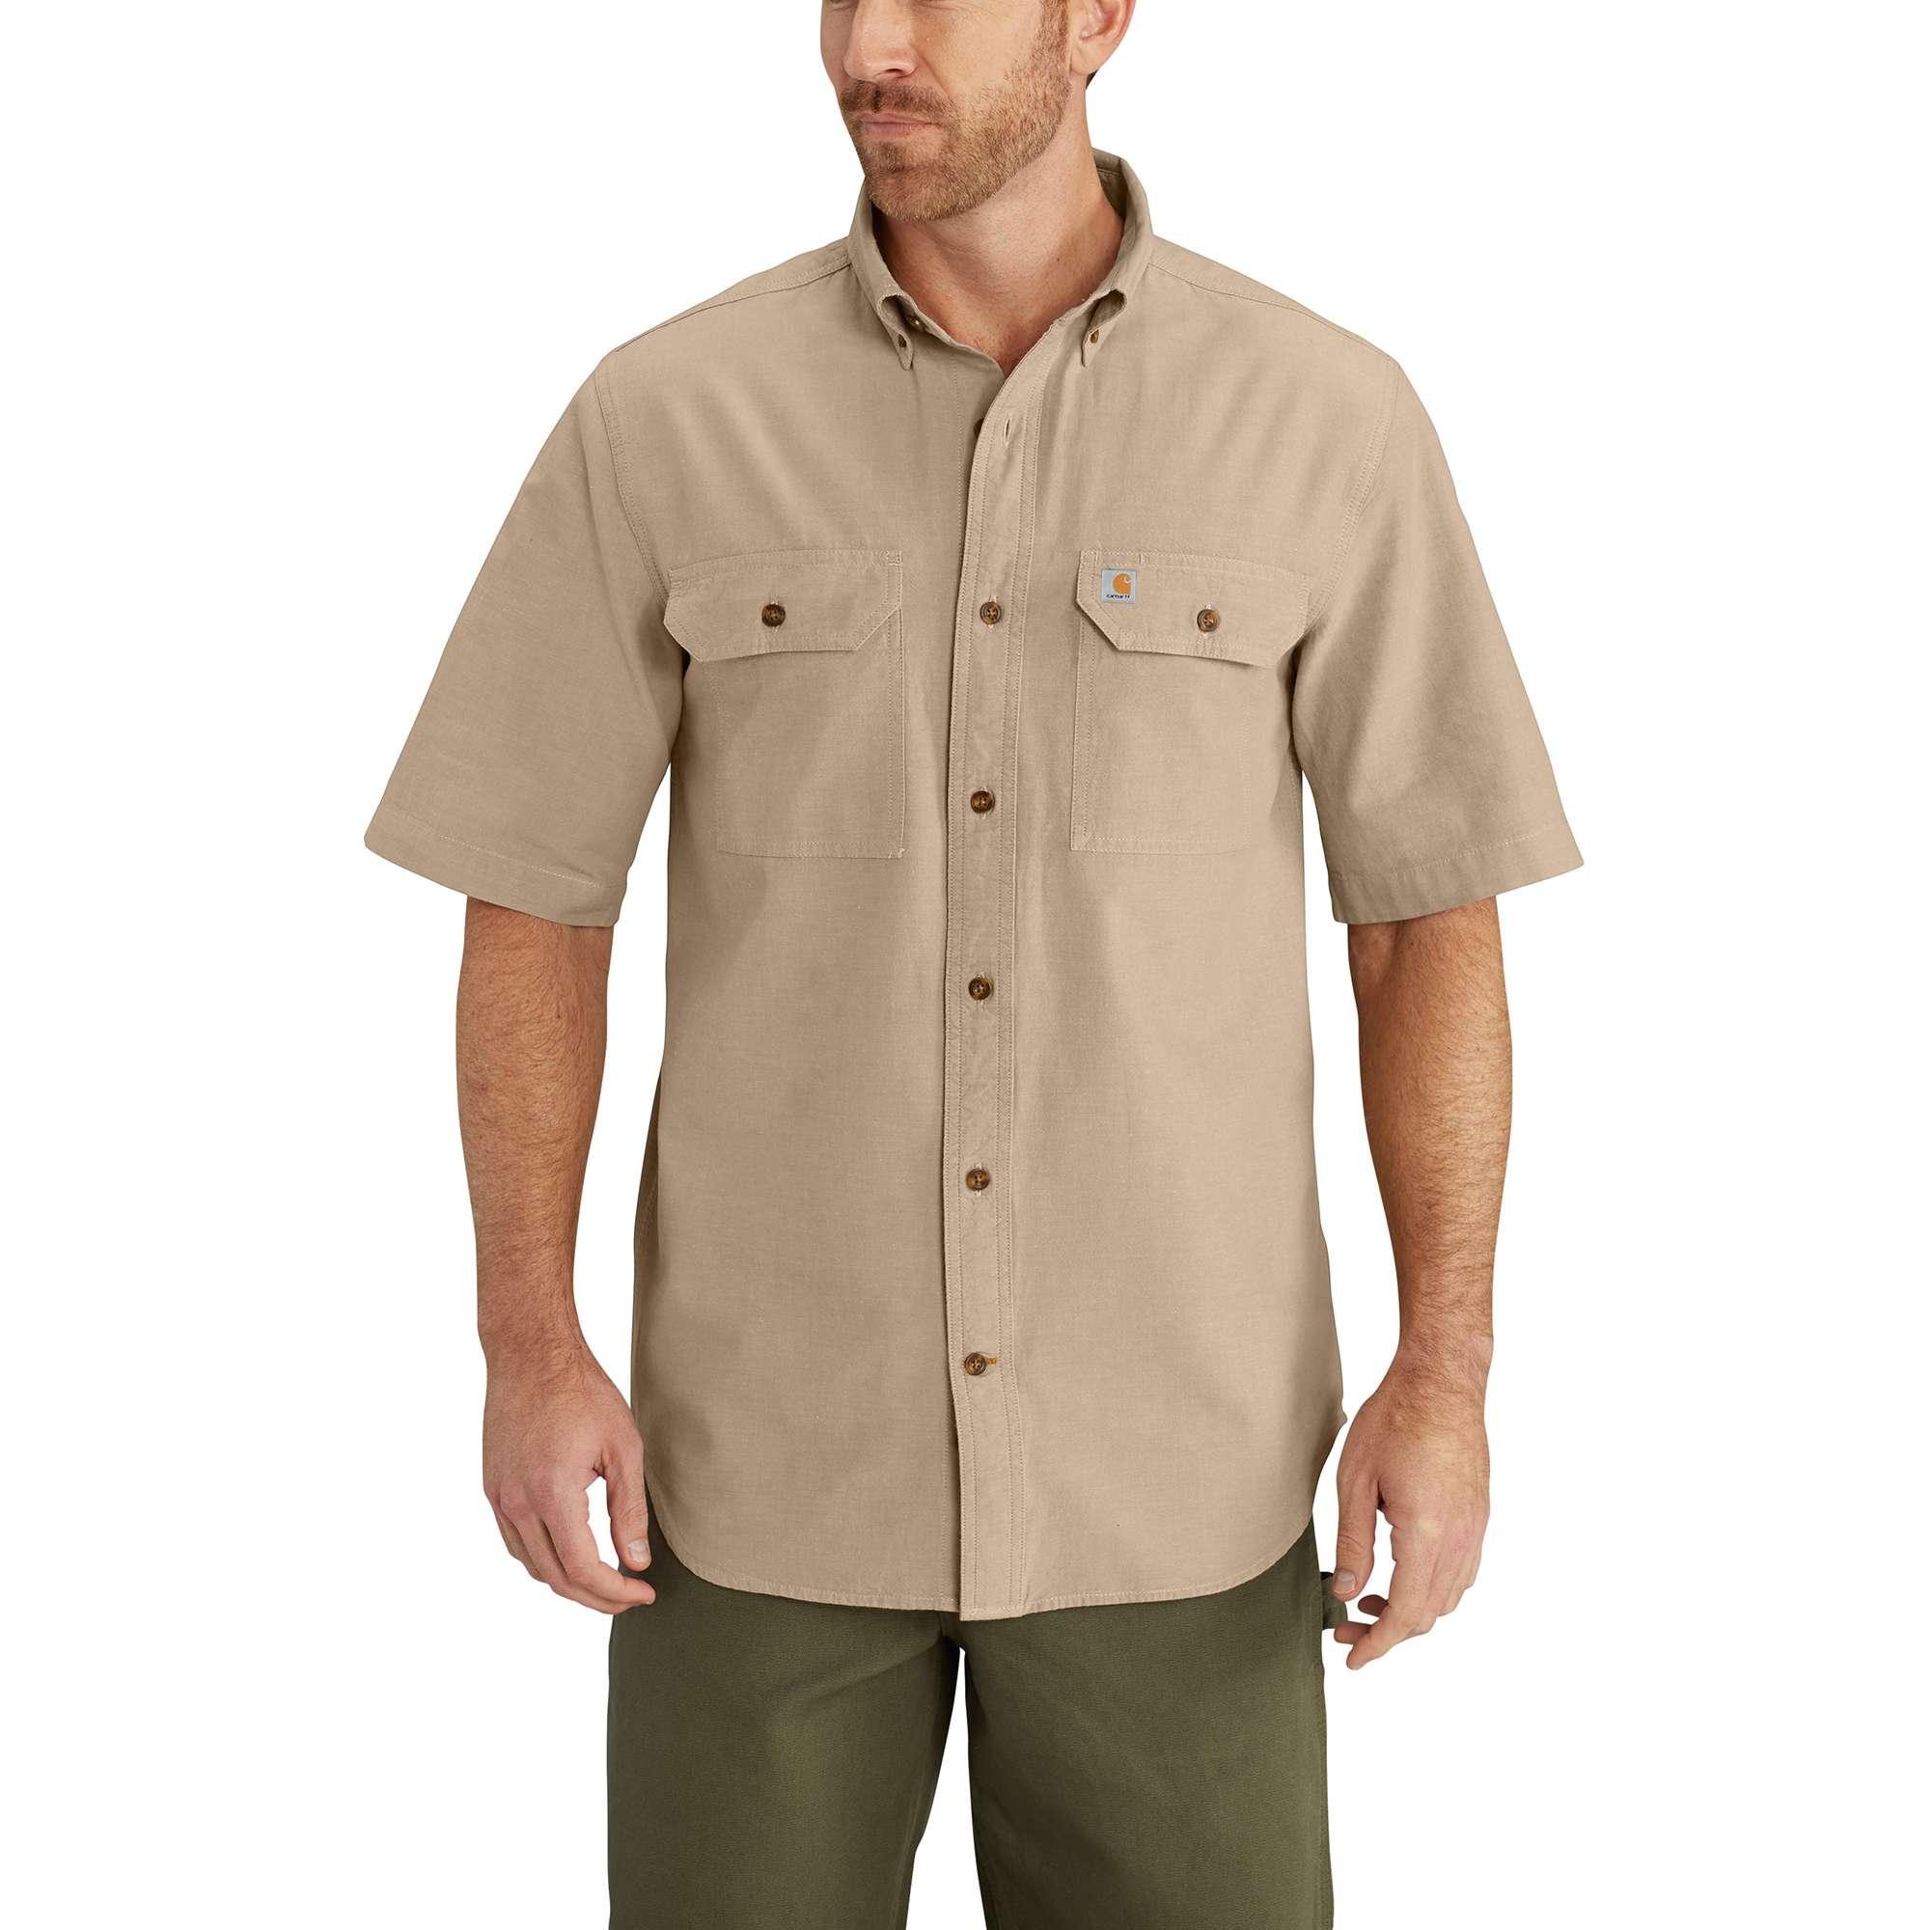 Carhartt Fort Short Sleeve Chambray Shirt